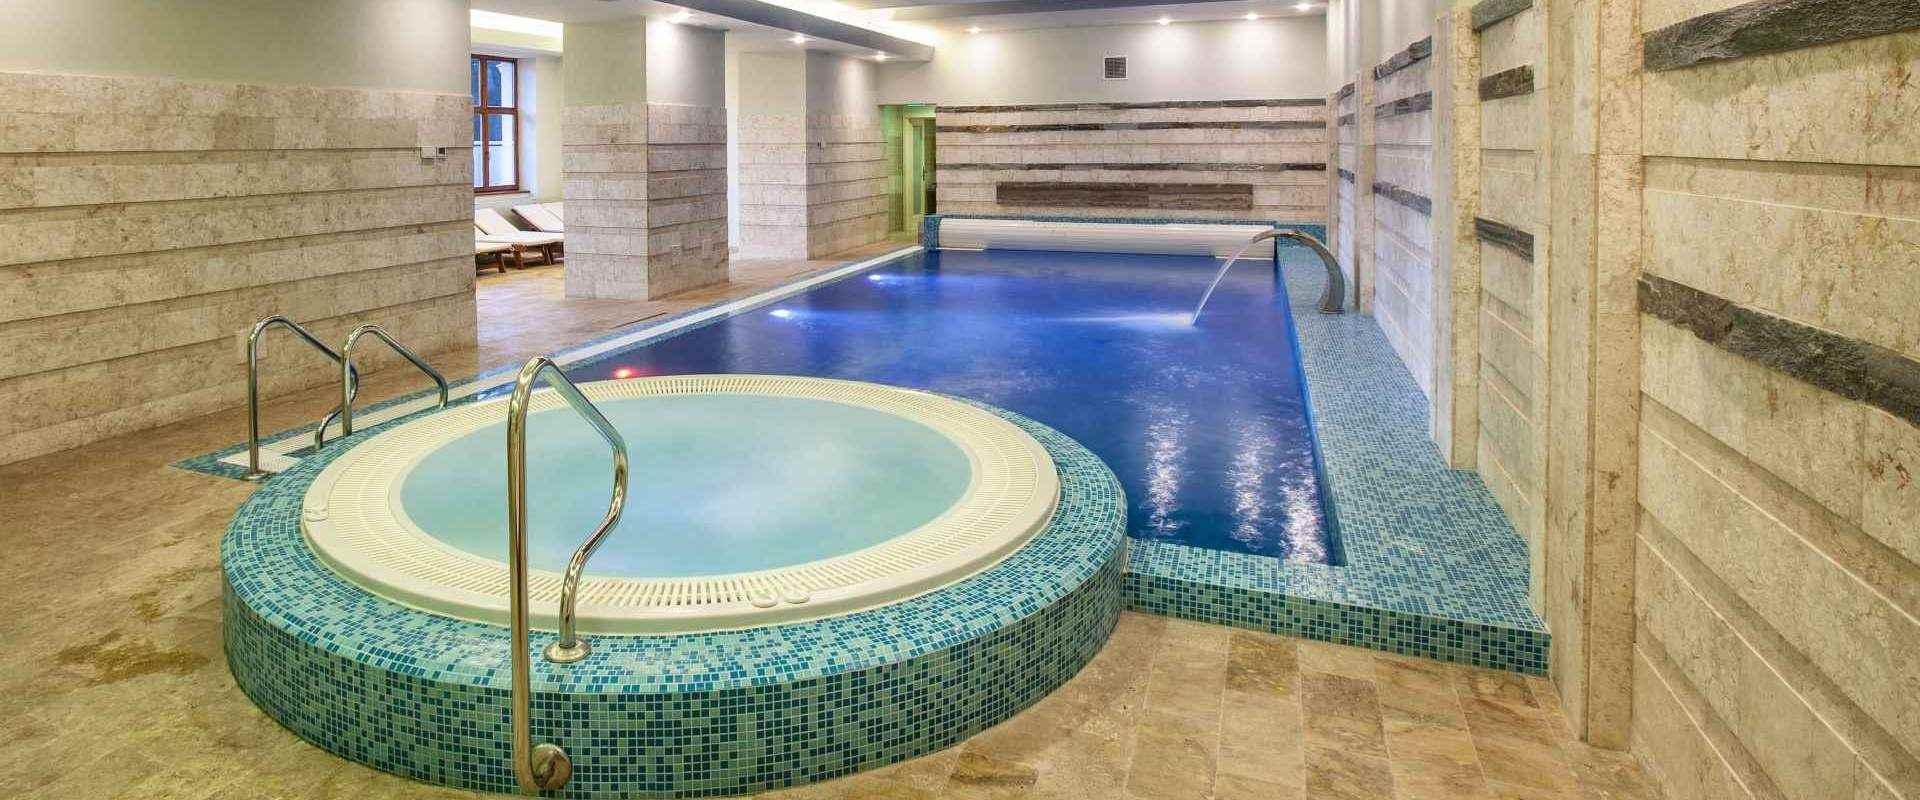 HOHE RINNE PALTINIS HOTEL SPA